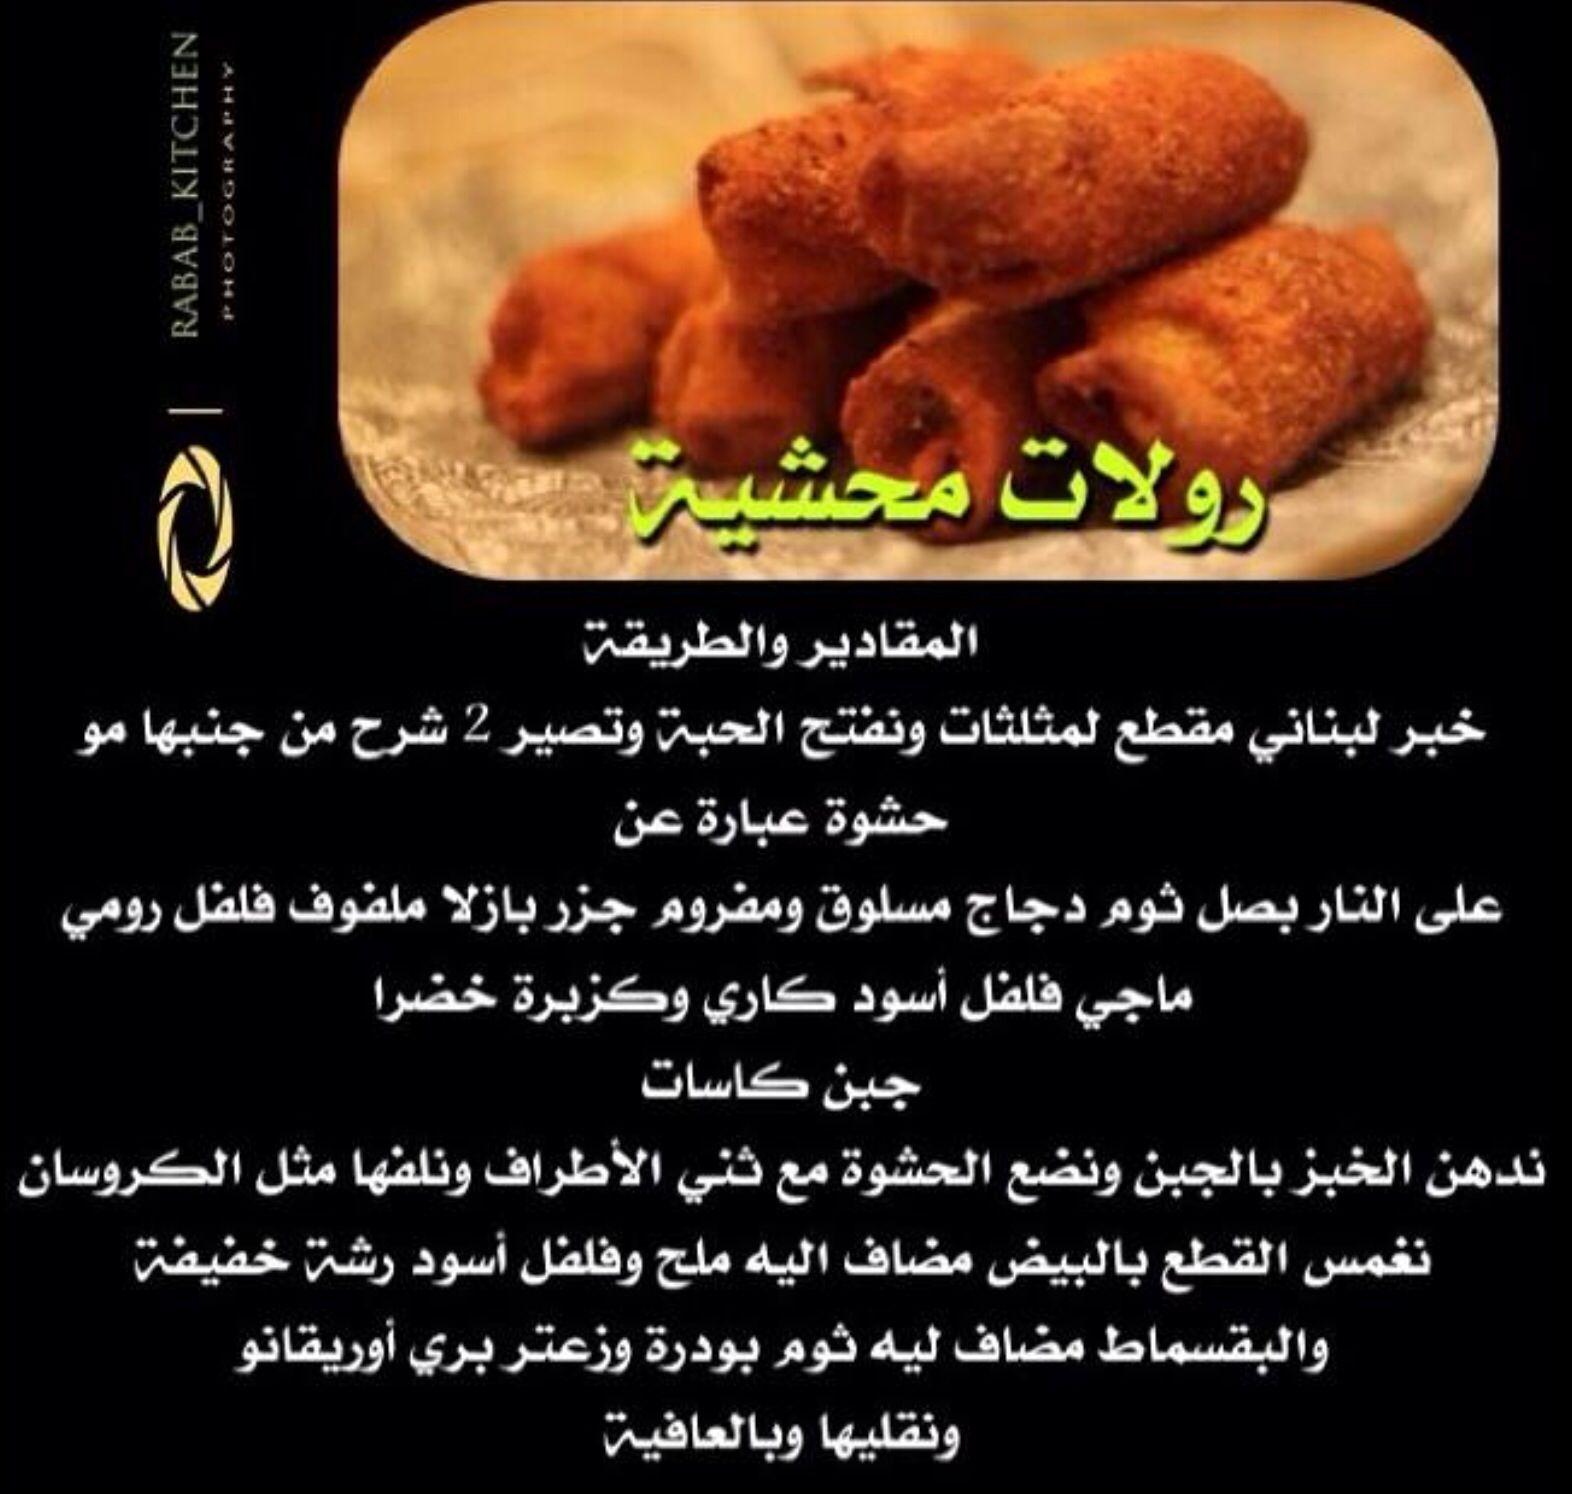 رولات الدجاج Cooking Food Chicken